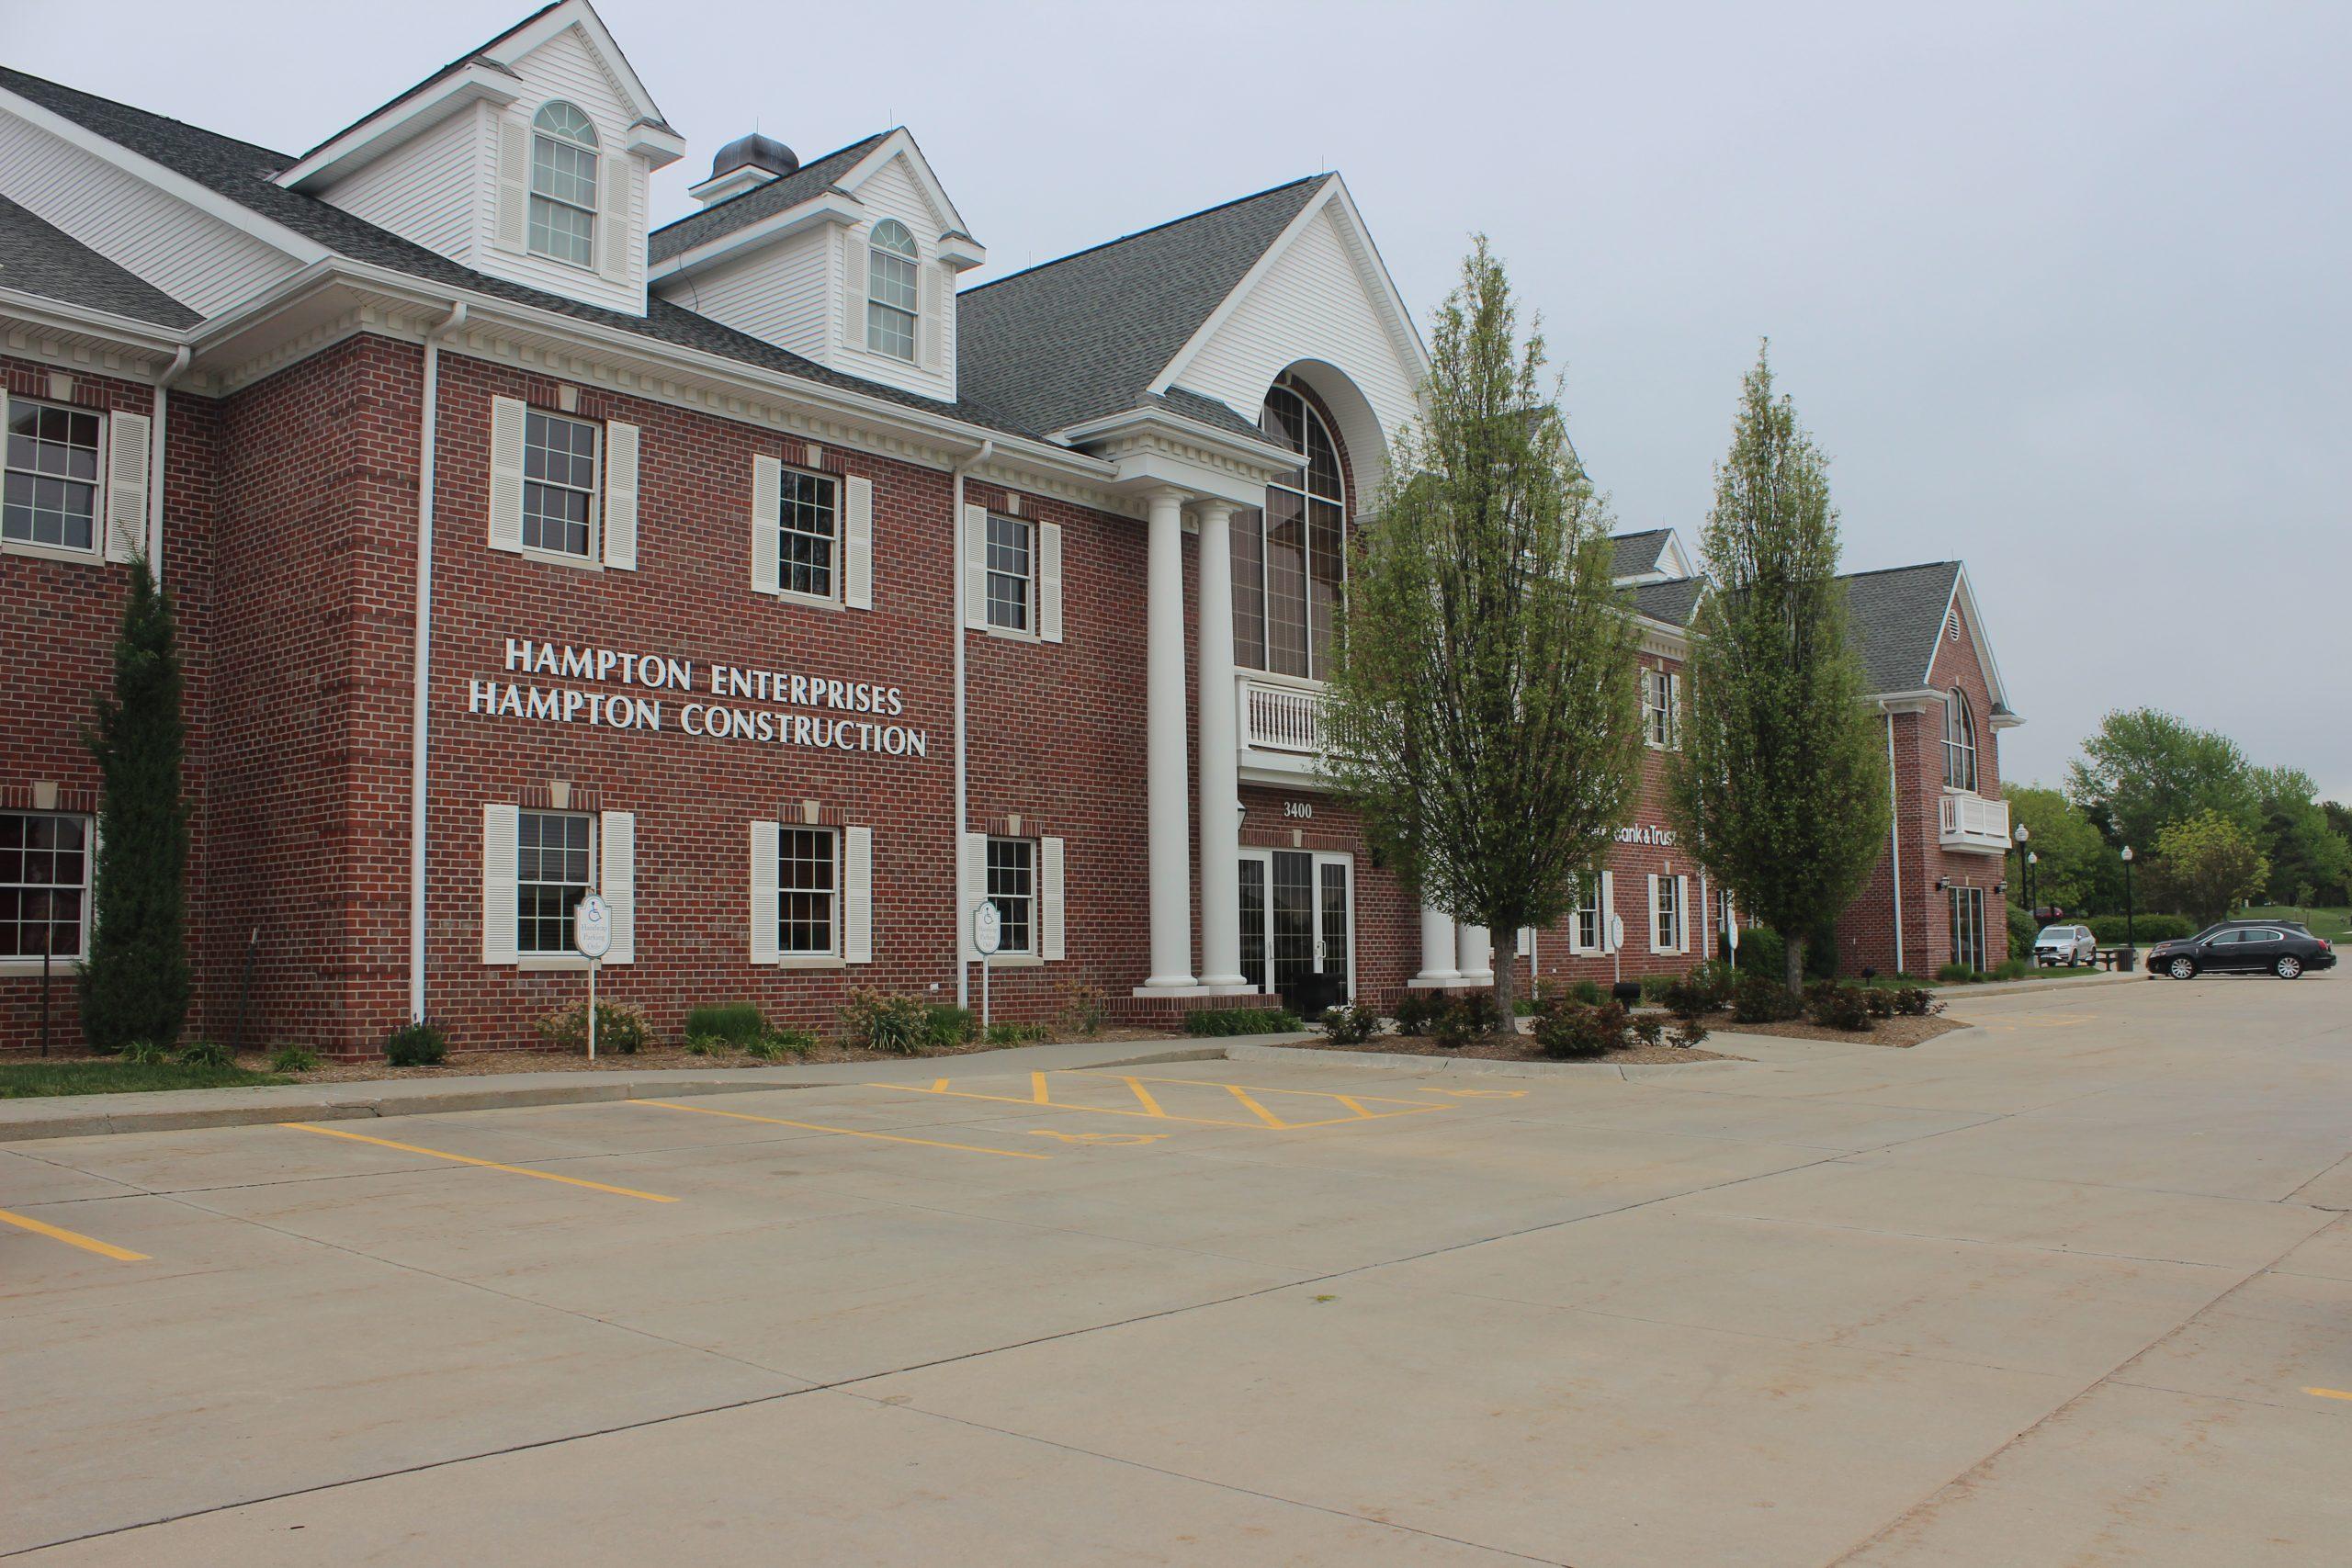 Hampton Enterprises – Properties & Construction, Lincoln, NE